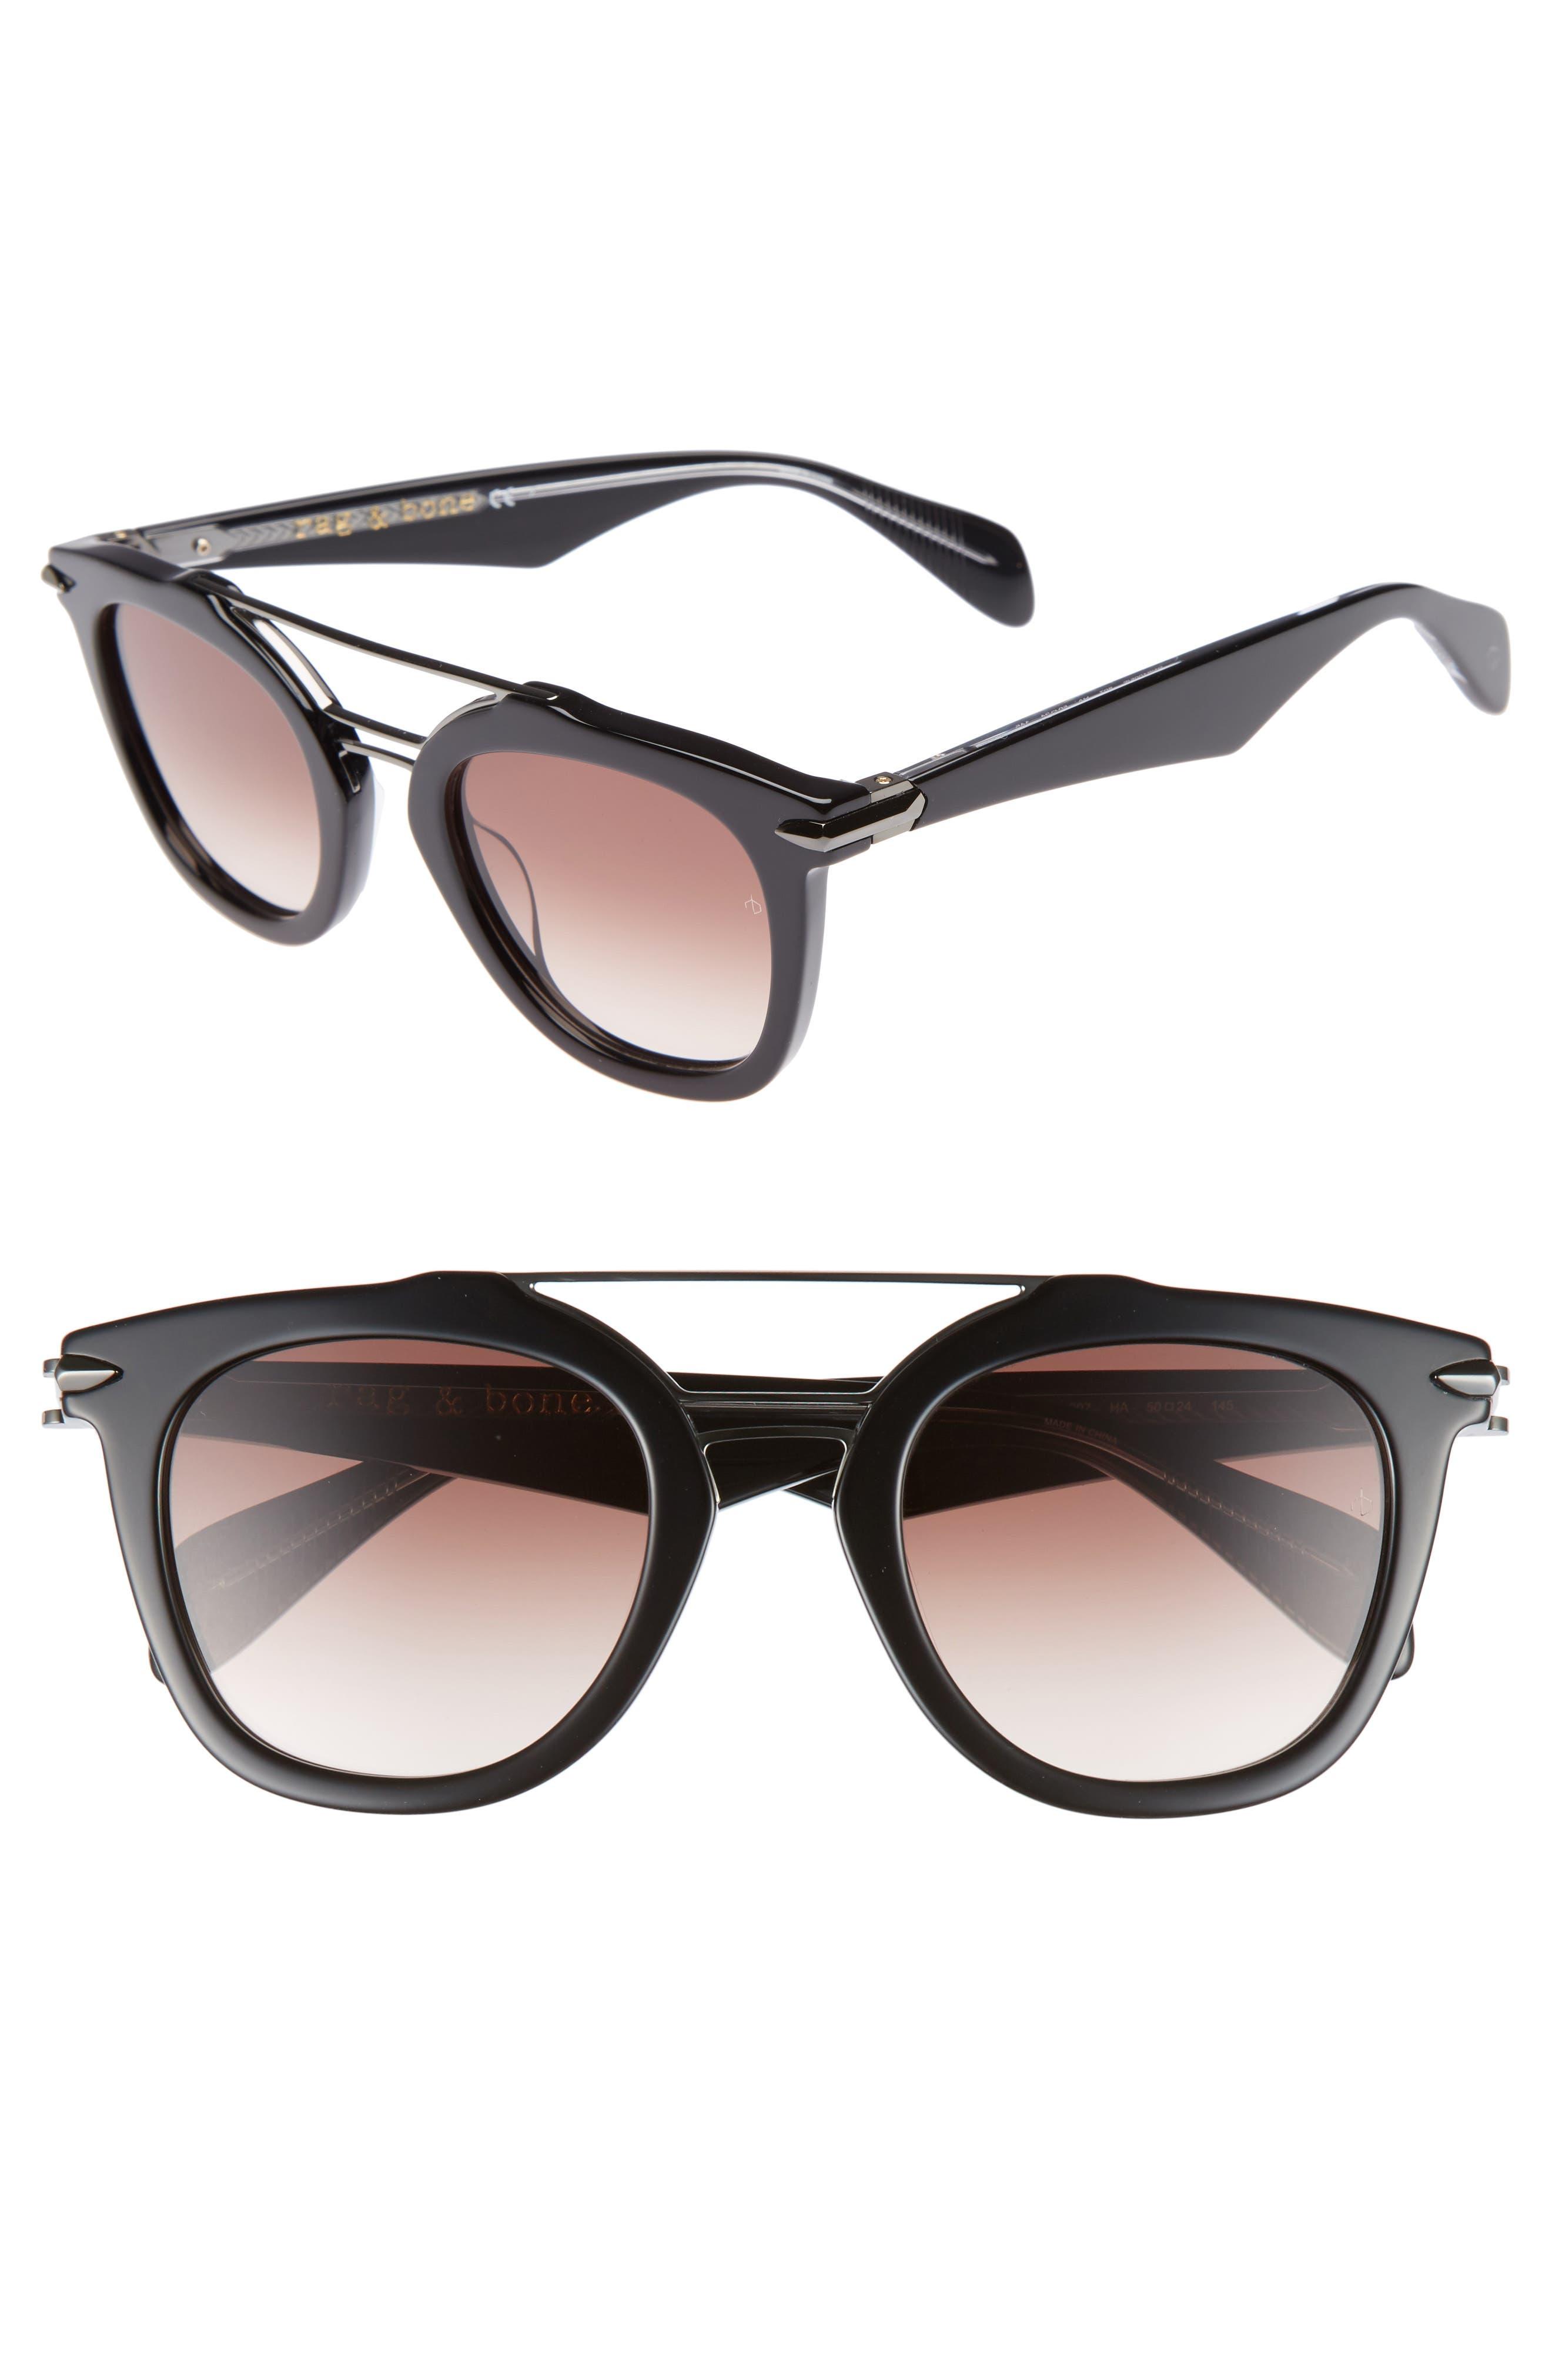 50mm Round Aviator Sunglasses,                             Main thumbnail 1, color,                             BLACK